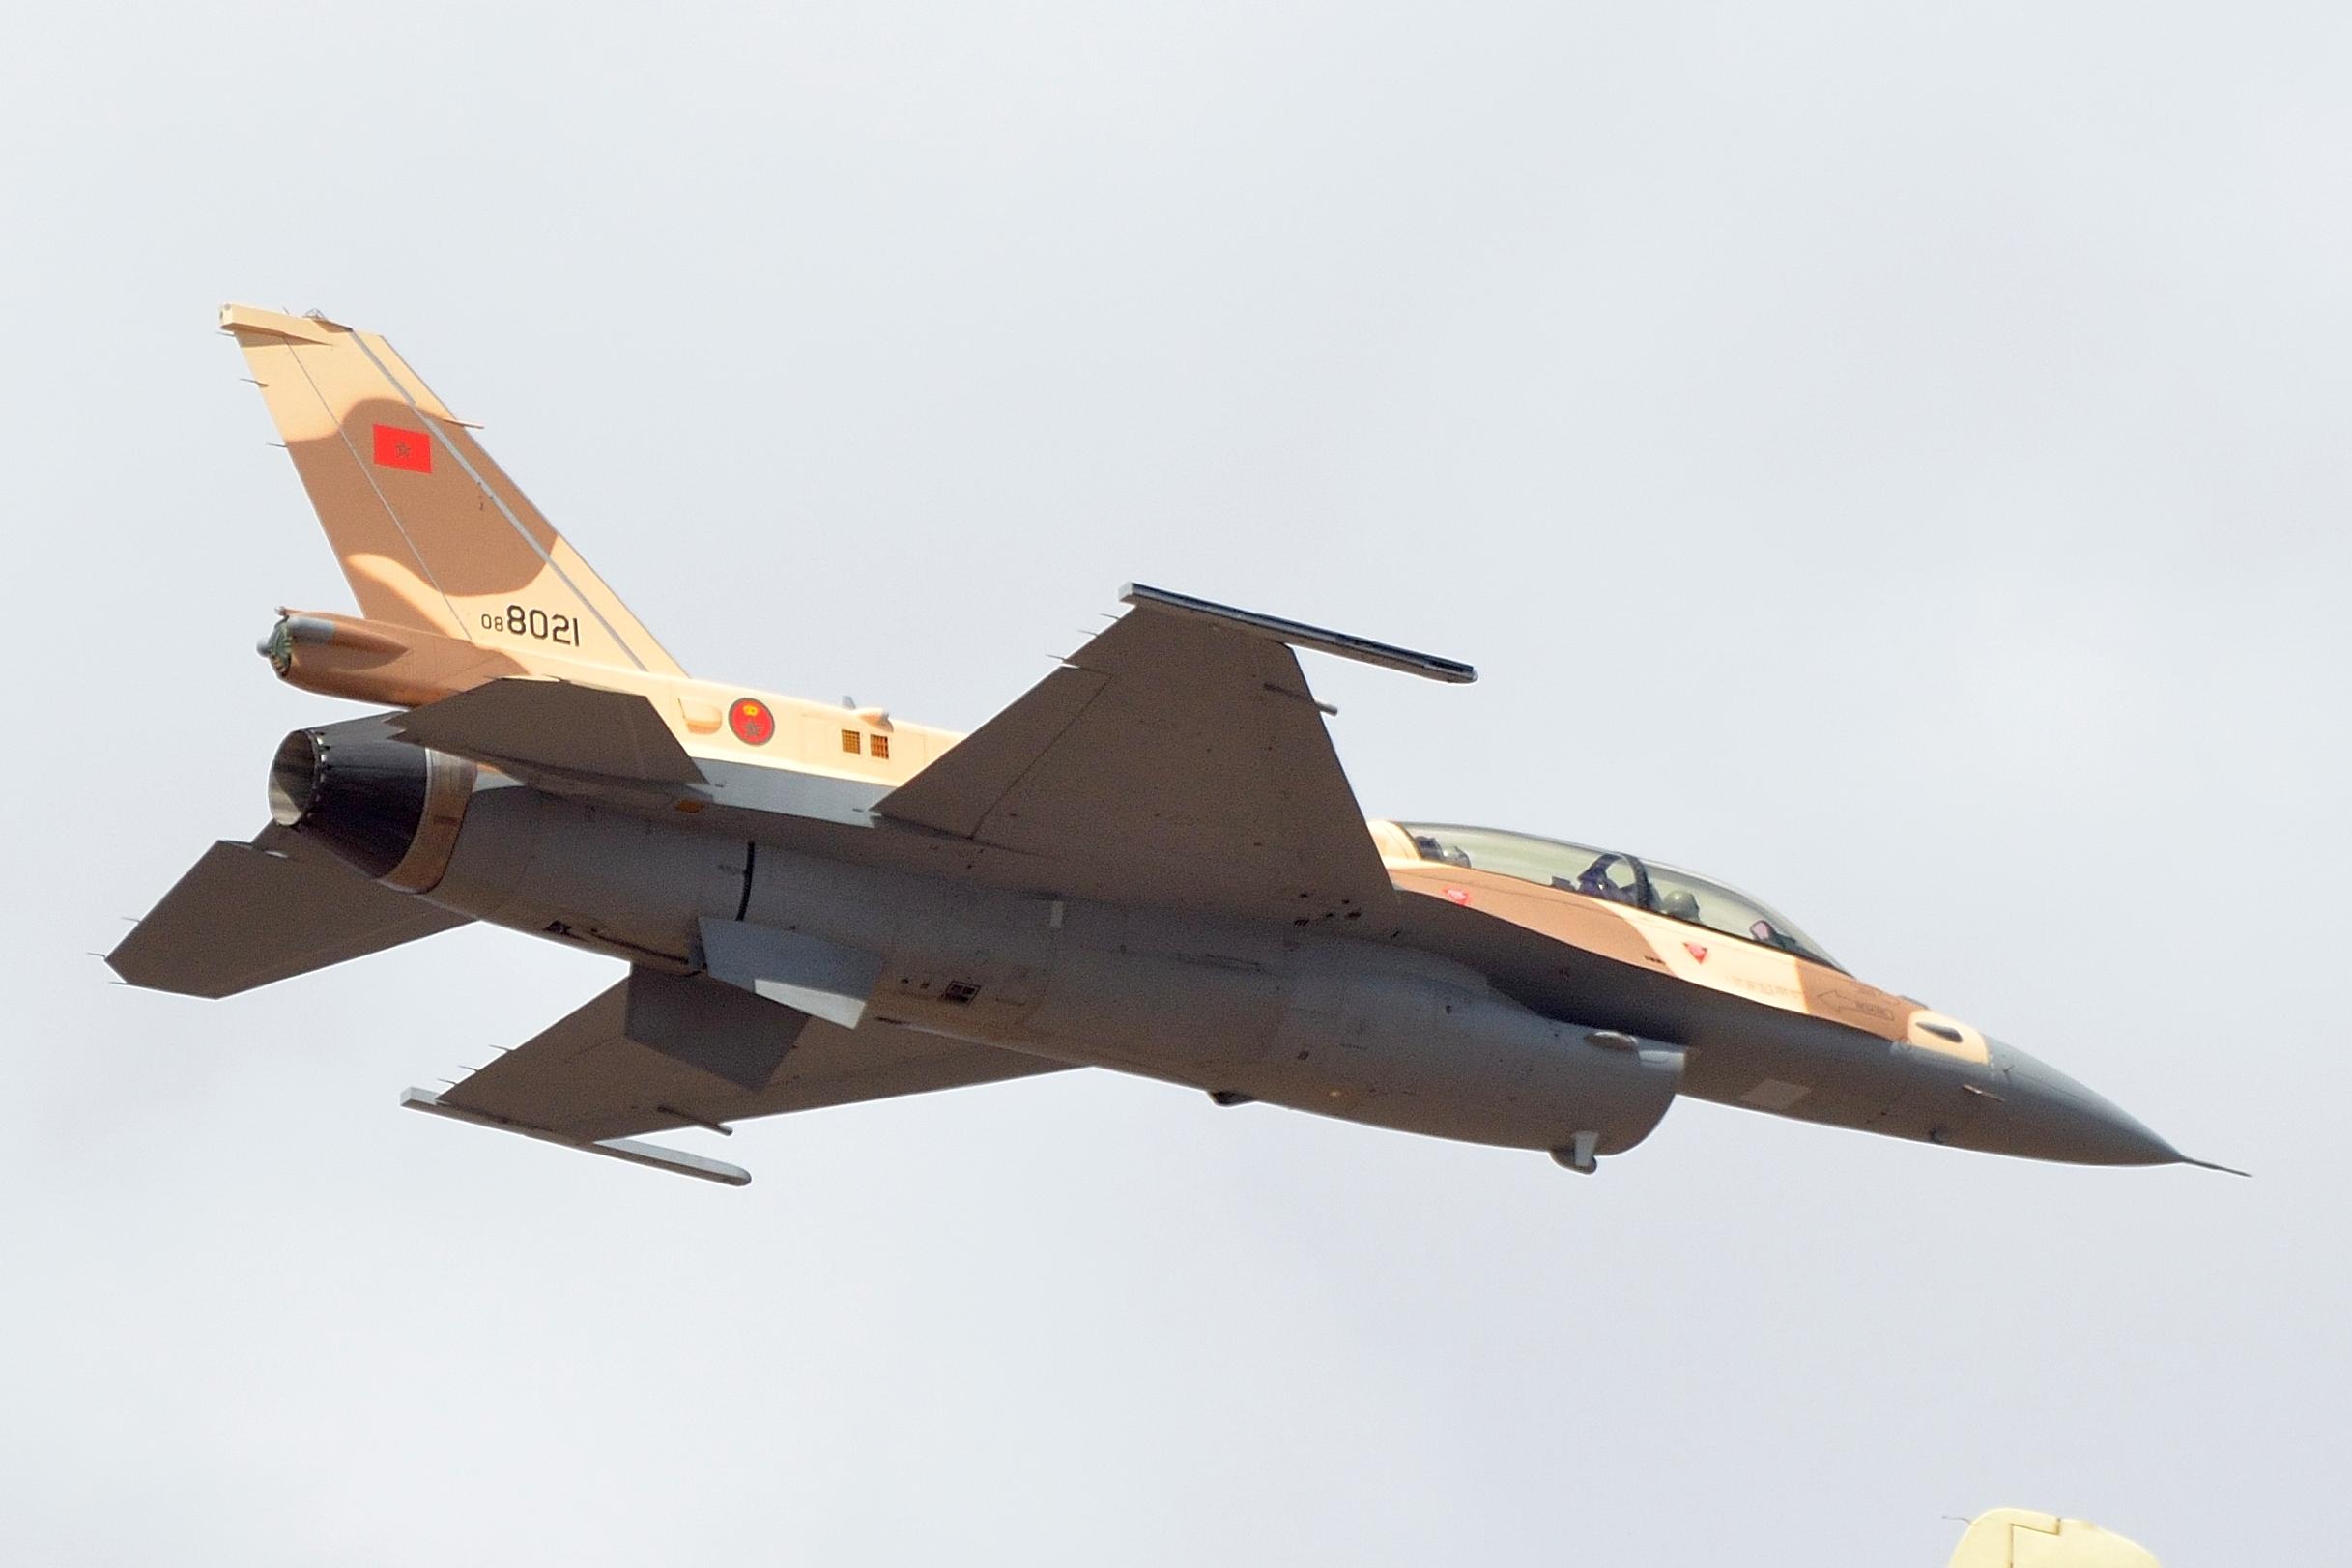 Moroccan F-16 Atlas Falcon / RMAF F16 block 52+ - Page 31 32173531240_639eaca9f1_o